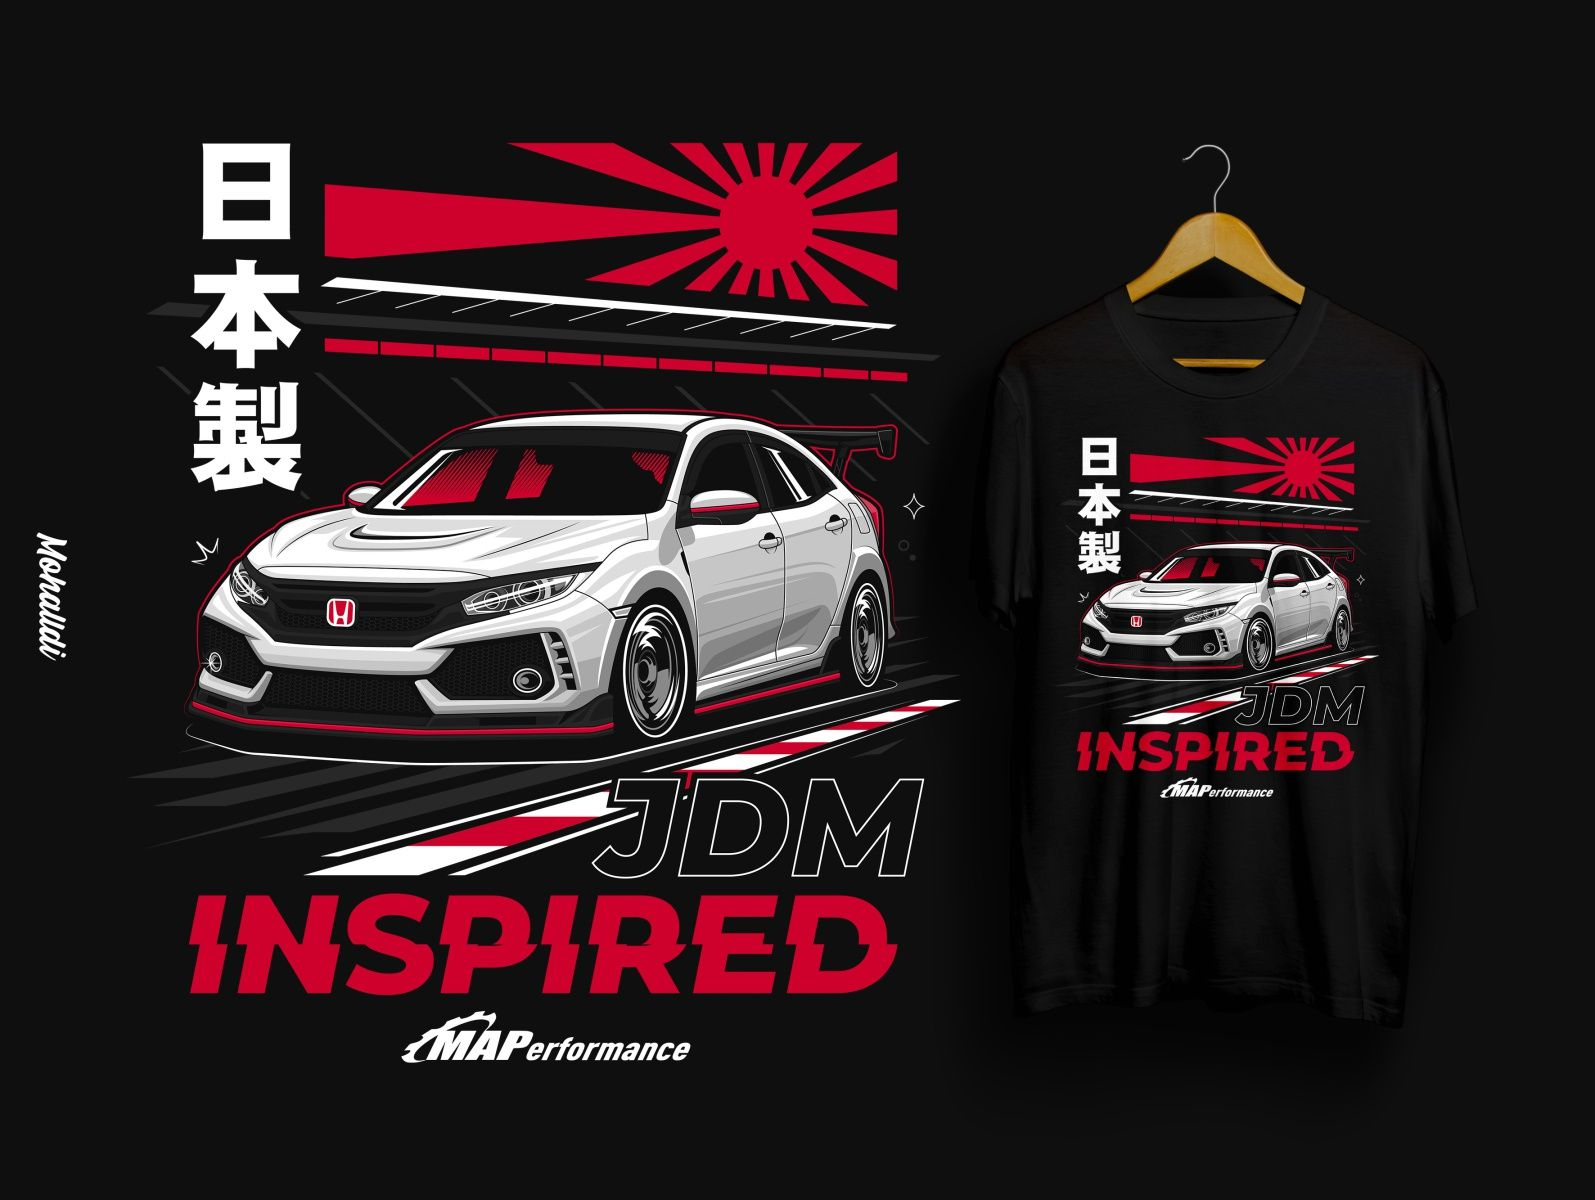 Honda Civic Type R Sport Car Illustration In 2021 Honda Civic Type R Honda Civic Car Sticker Design [ 1200 x 1595 Pixel ]